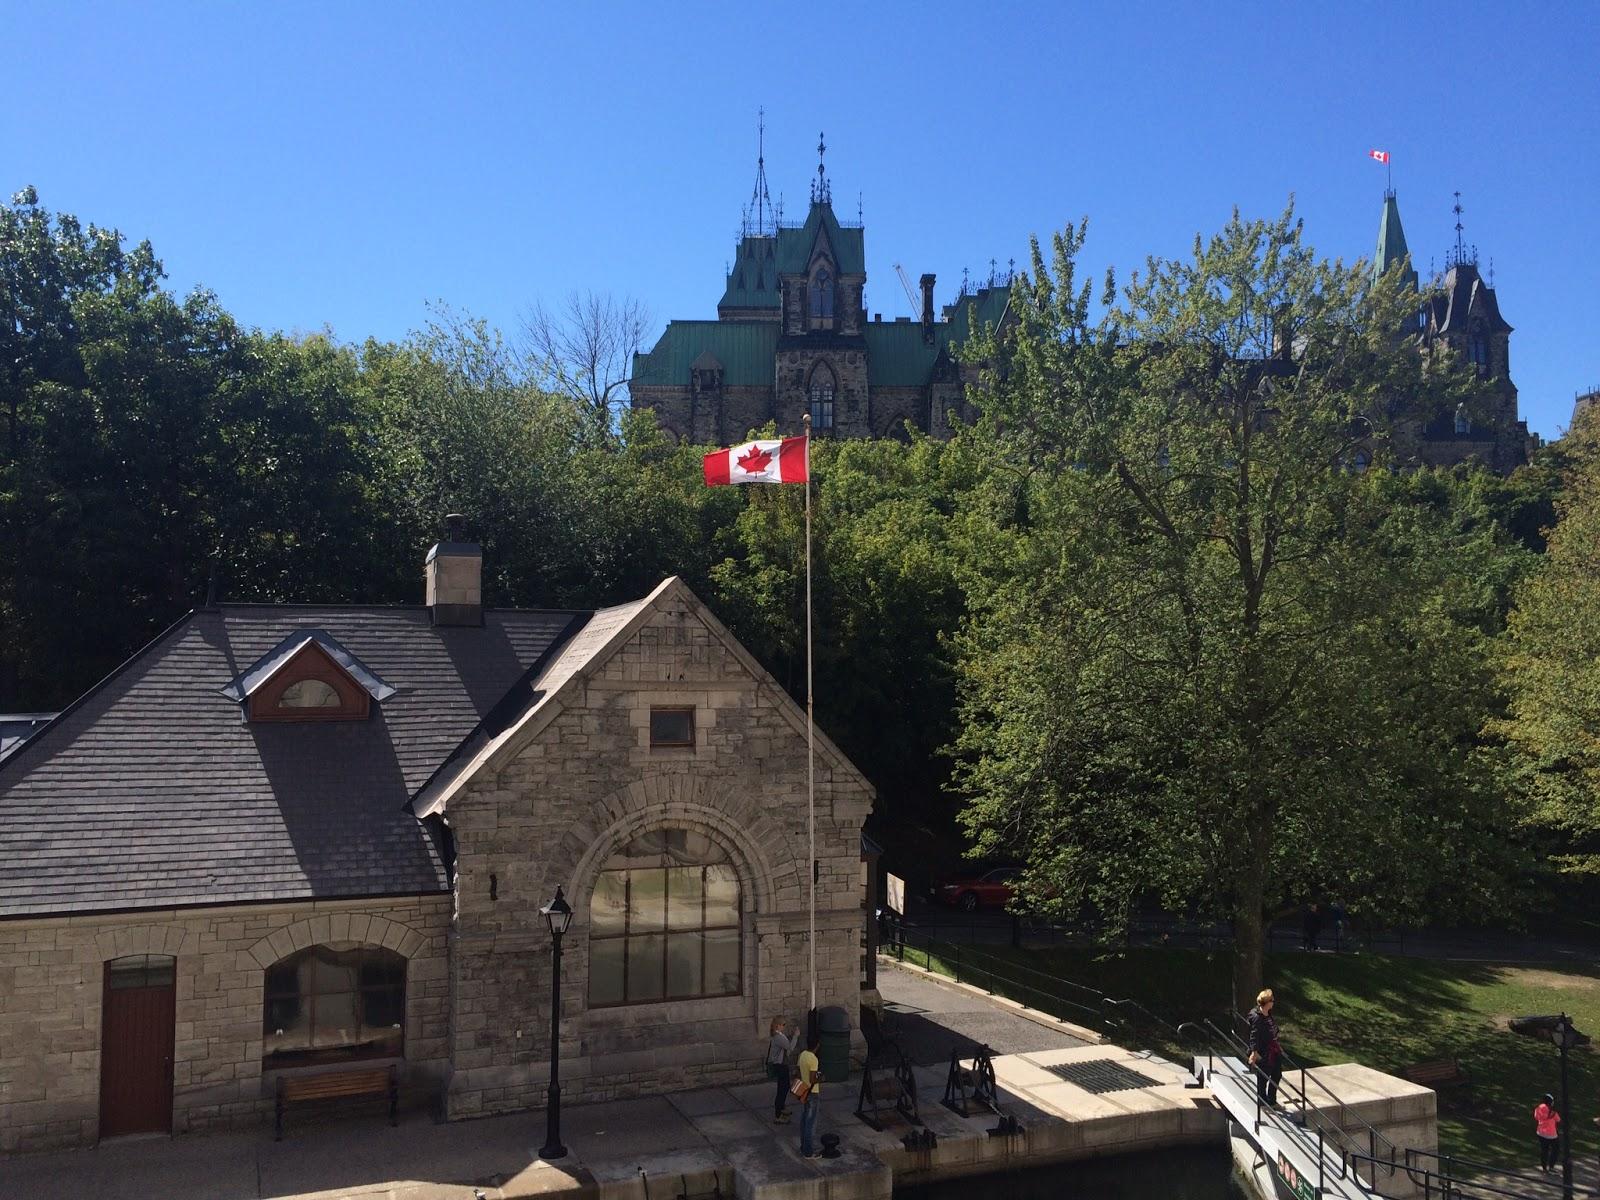 Canada - House with Maple Leaf flag